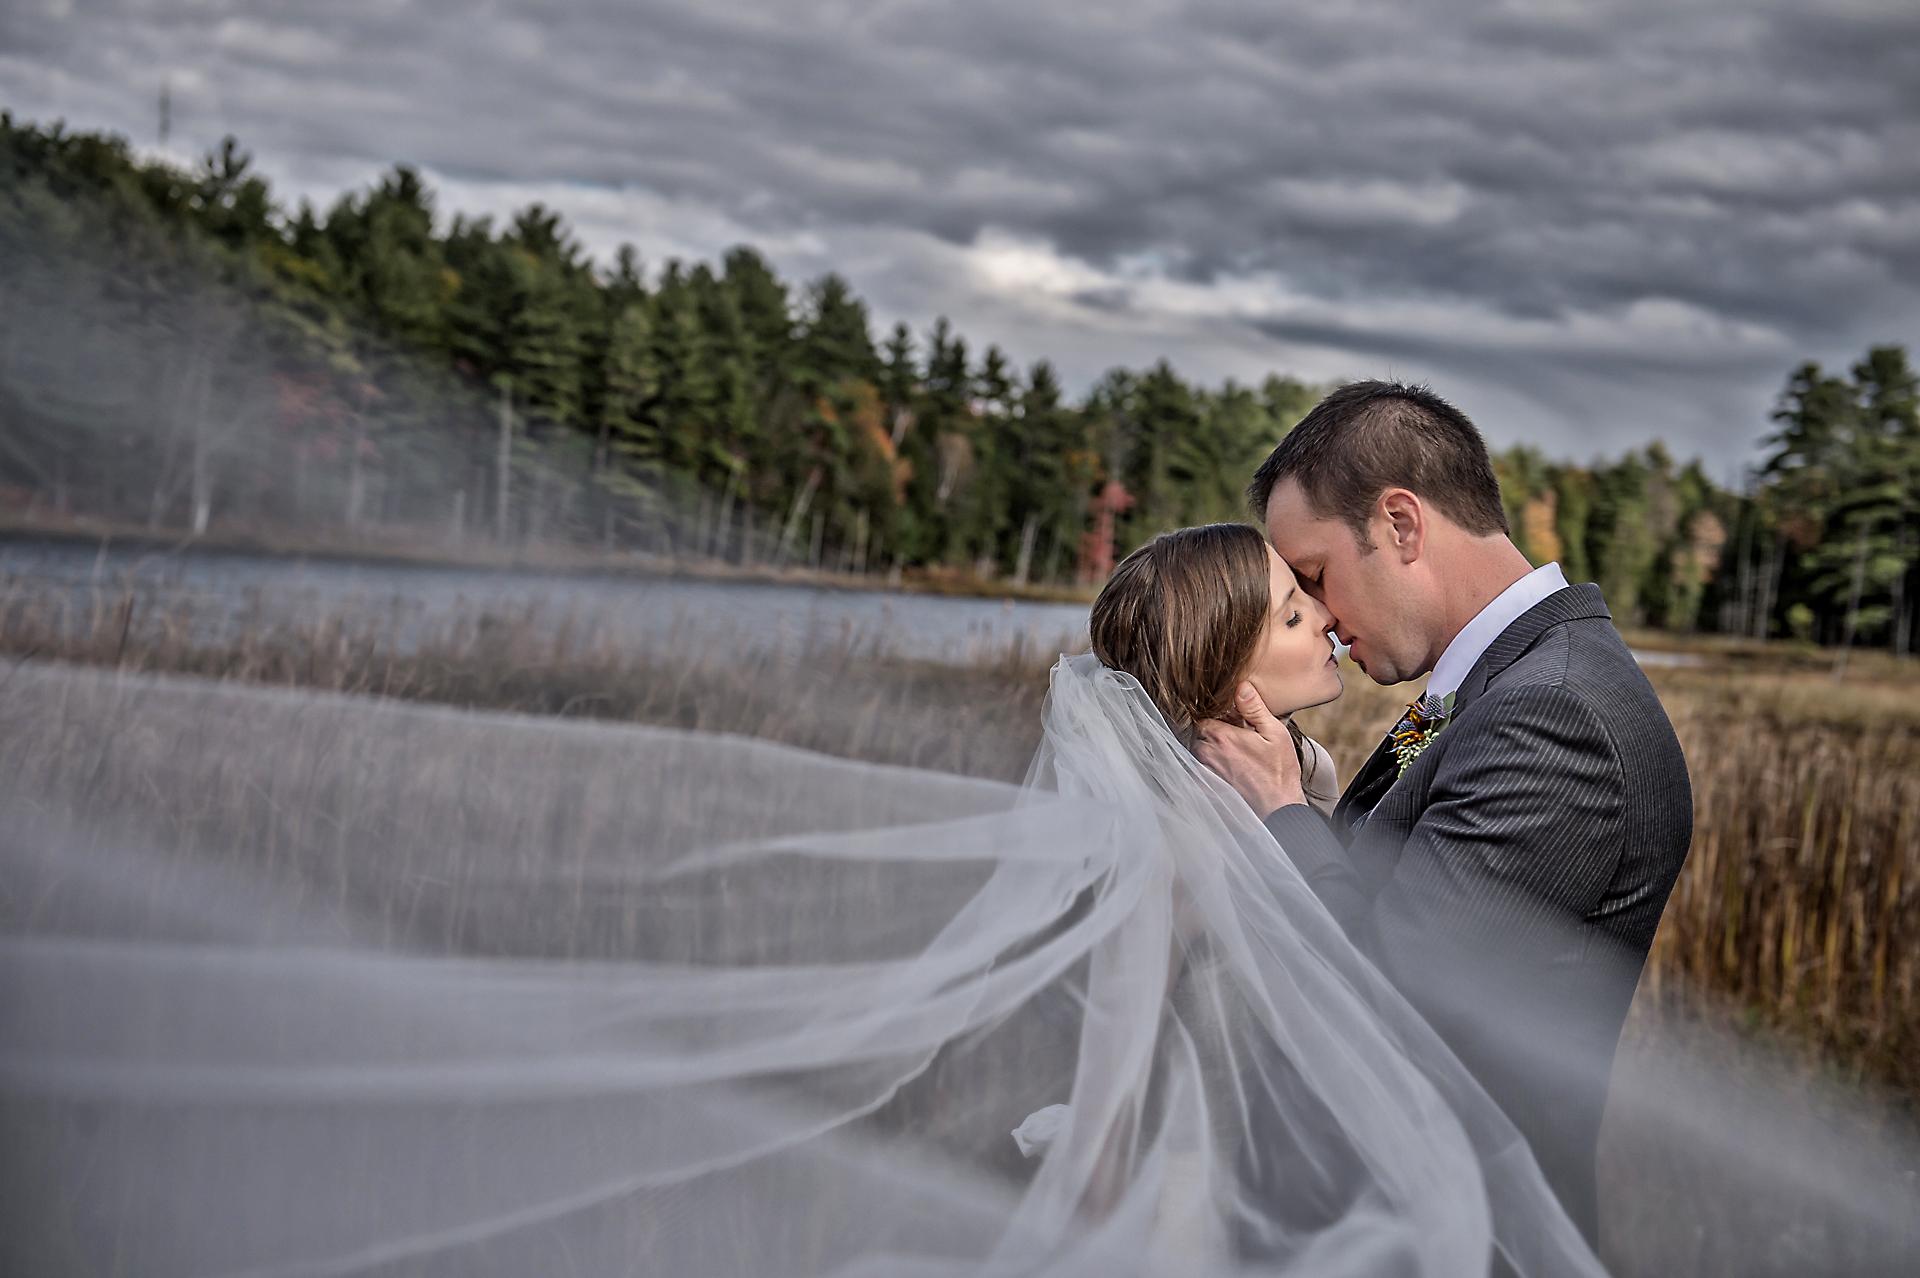 Nathan & Linda | Brooksfield Farms Wedding | Muskoka Wedding Photography22